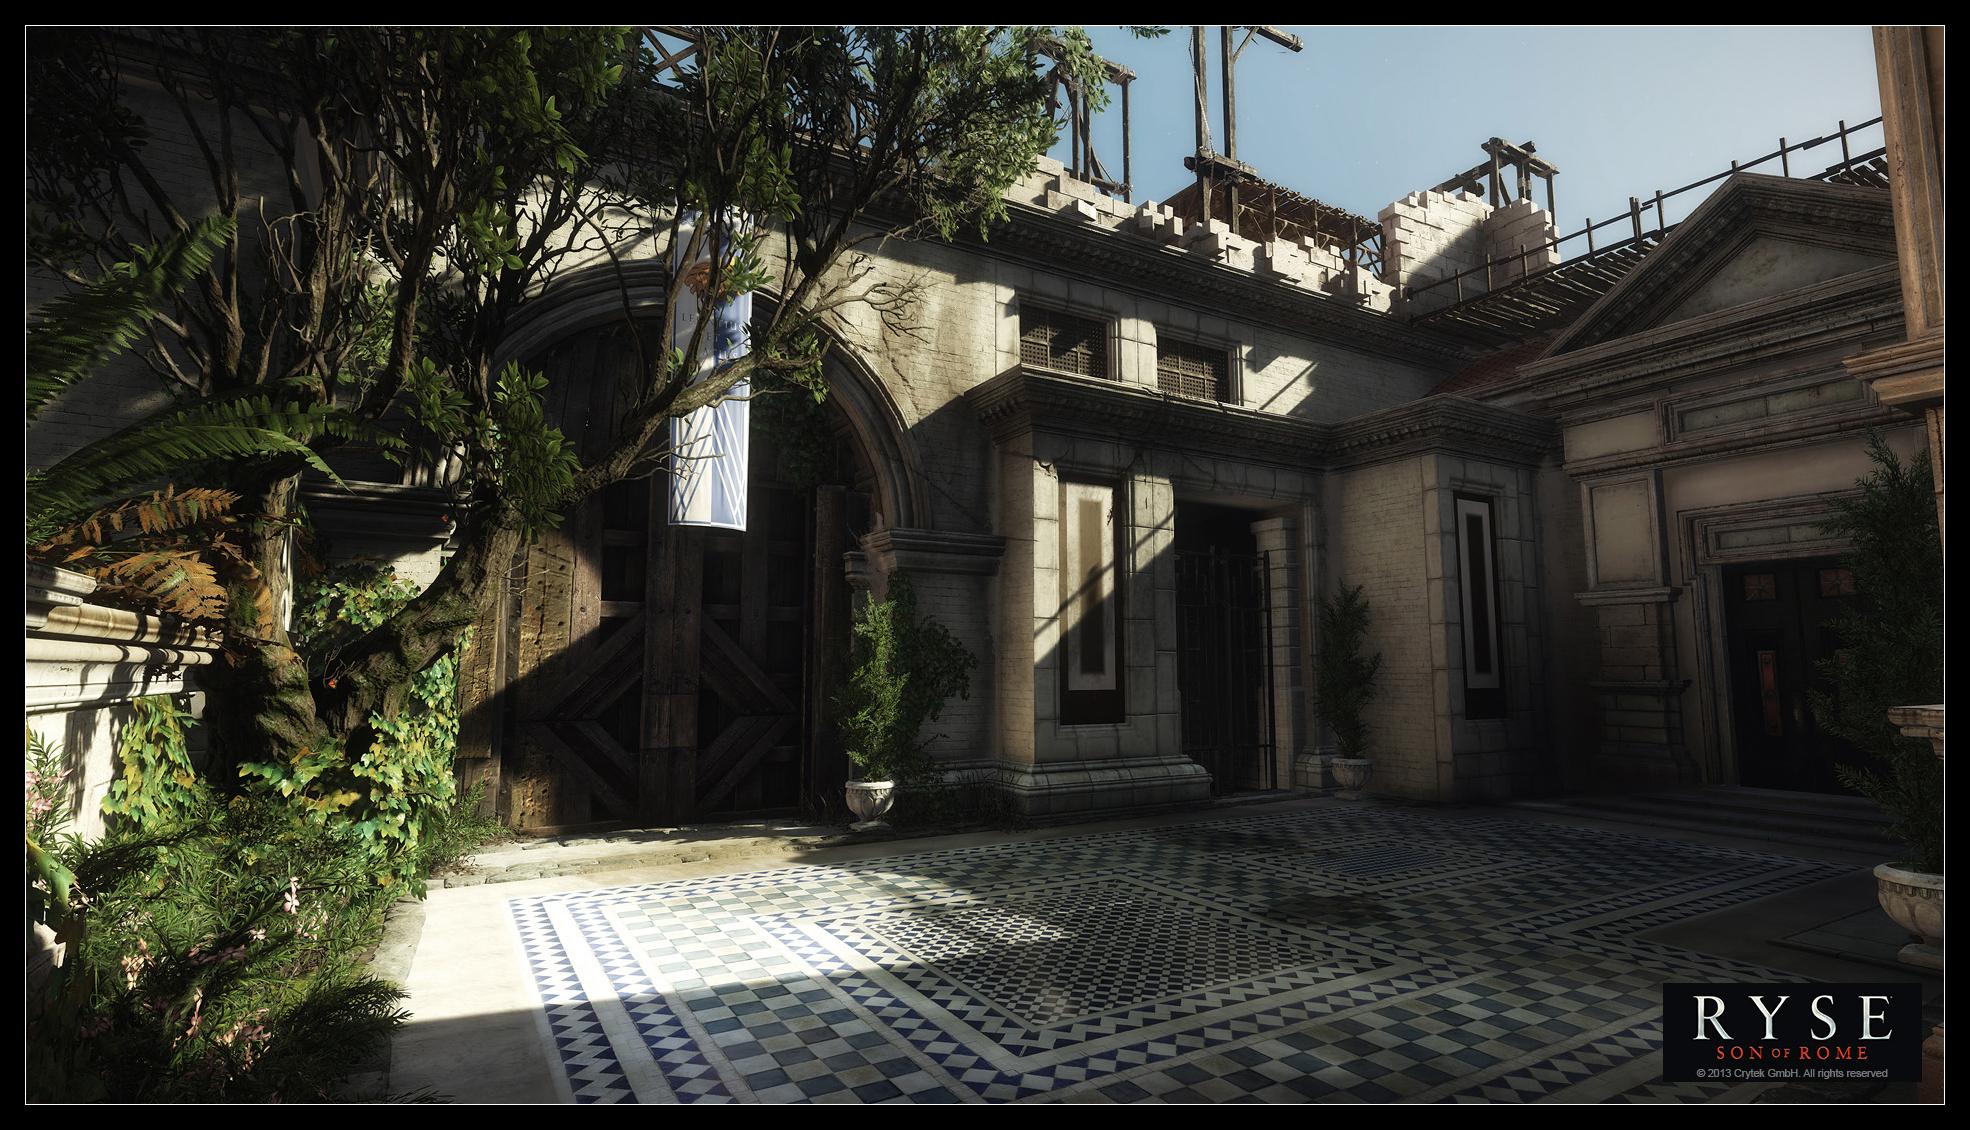 Ryse Son Of Rome Microsoft Crytek Image 9 By